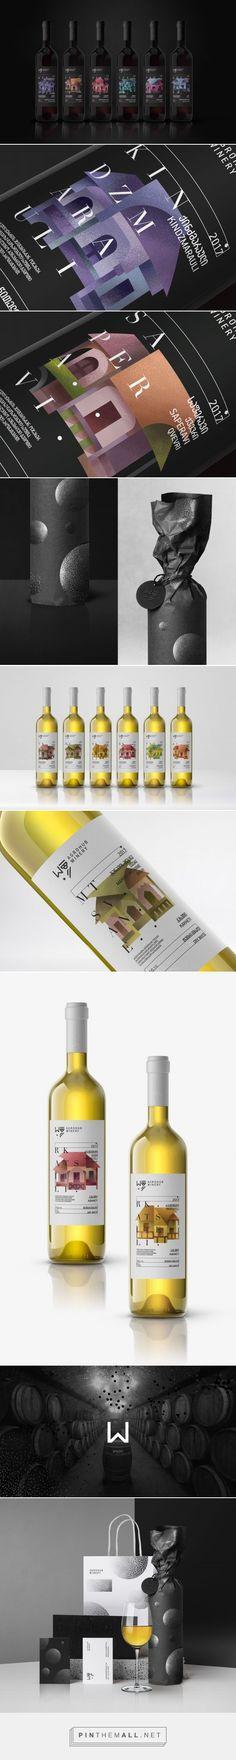 Agrohub Winery packaging design by BRID - https://www.packagingoftheworld.com/2018/07/agrohub-winery.html